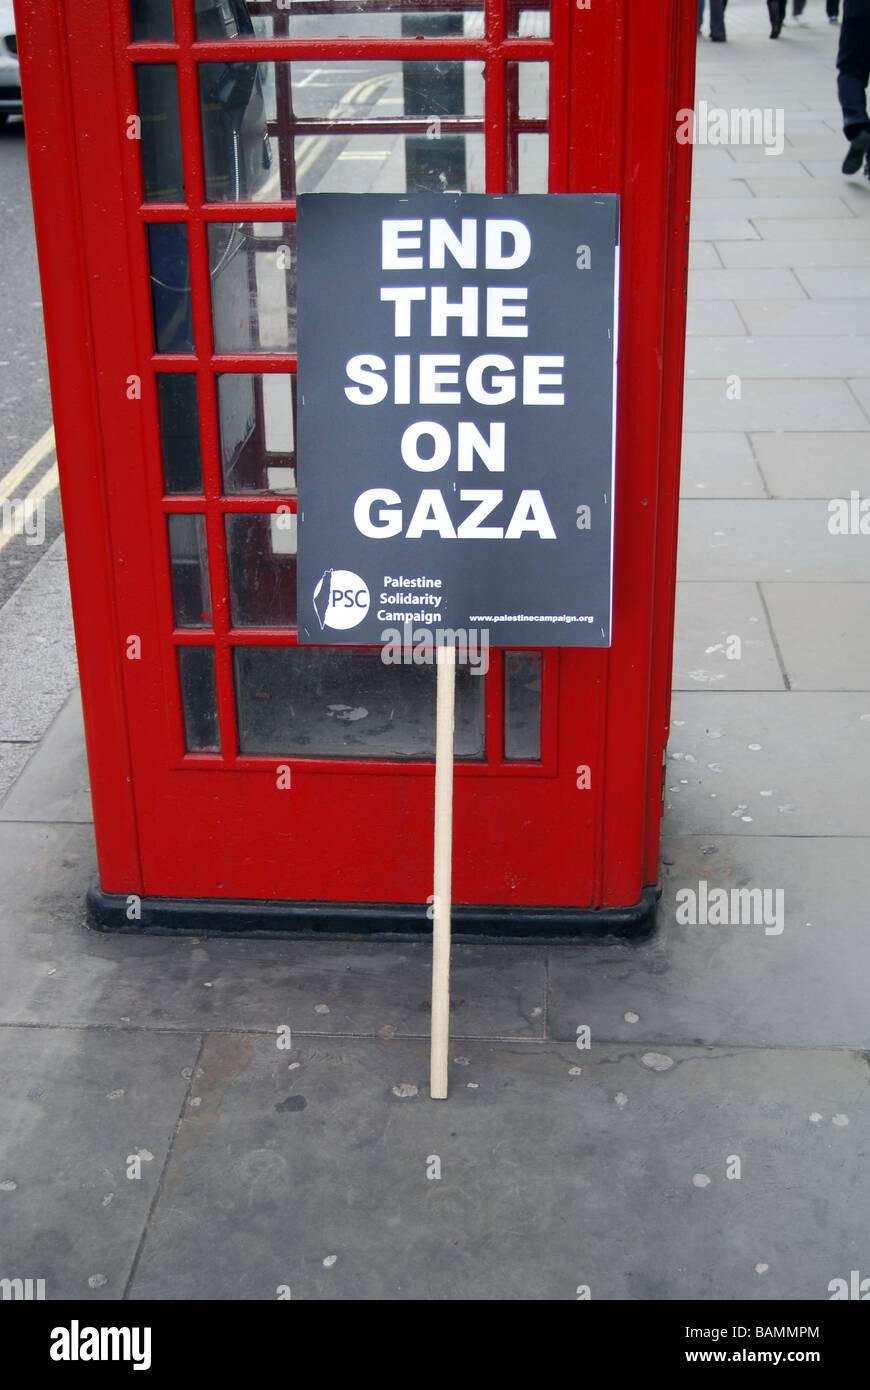 Siege in Gaza placard Red telephone kiosk London - Stock Image